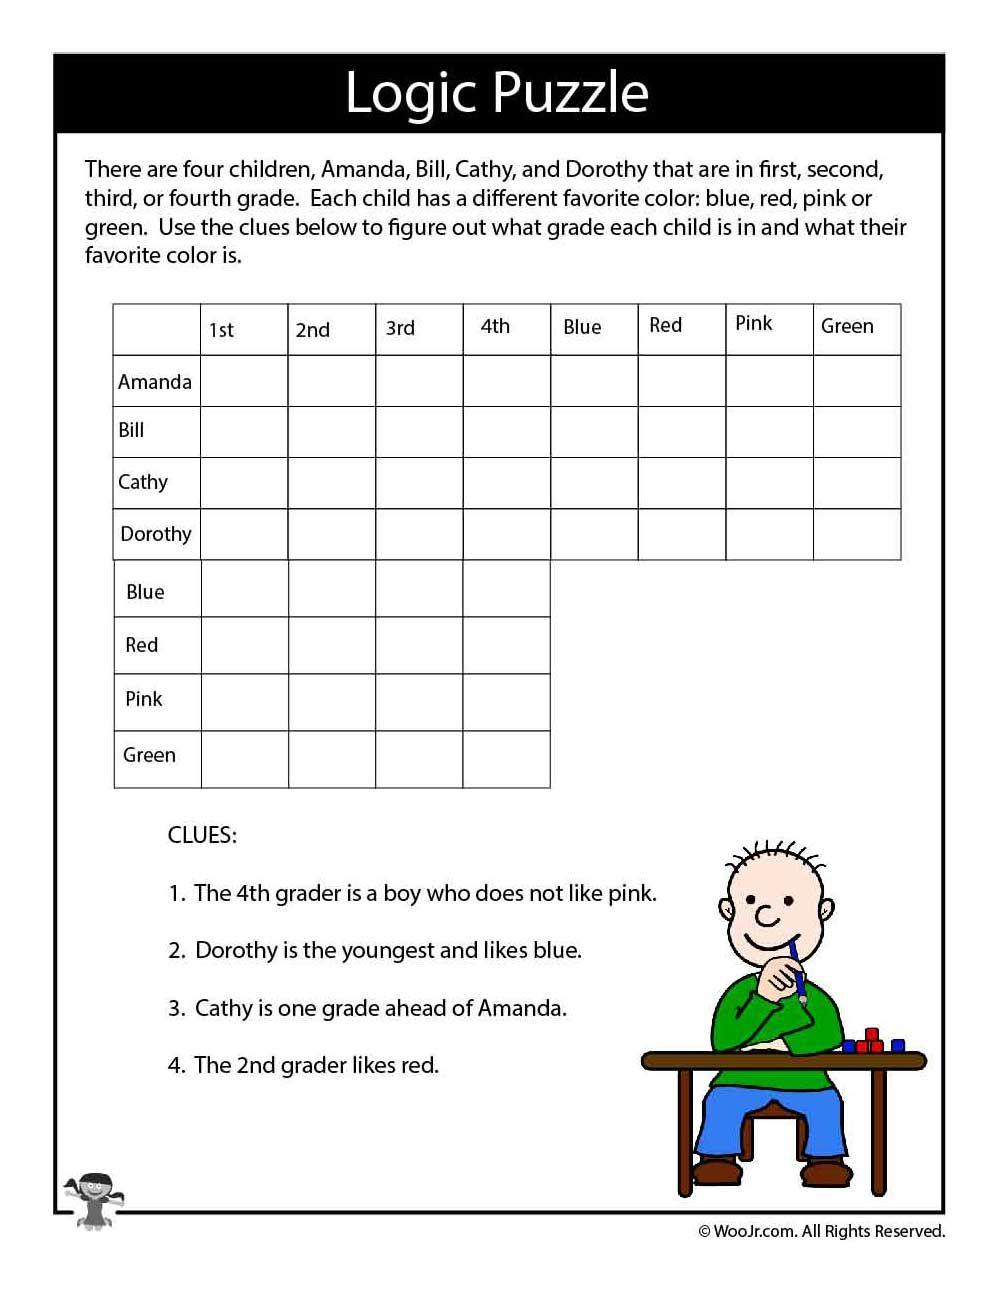 Hard Logic Puzzle for Kids   Woo! Jr. Kids Activities   Math logic puzzles [ 1294 x 1000 Pixel ]